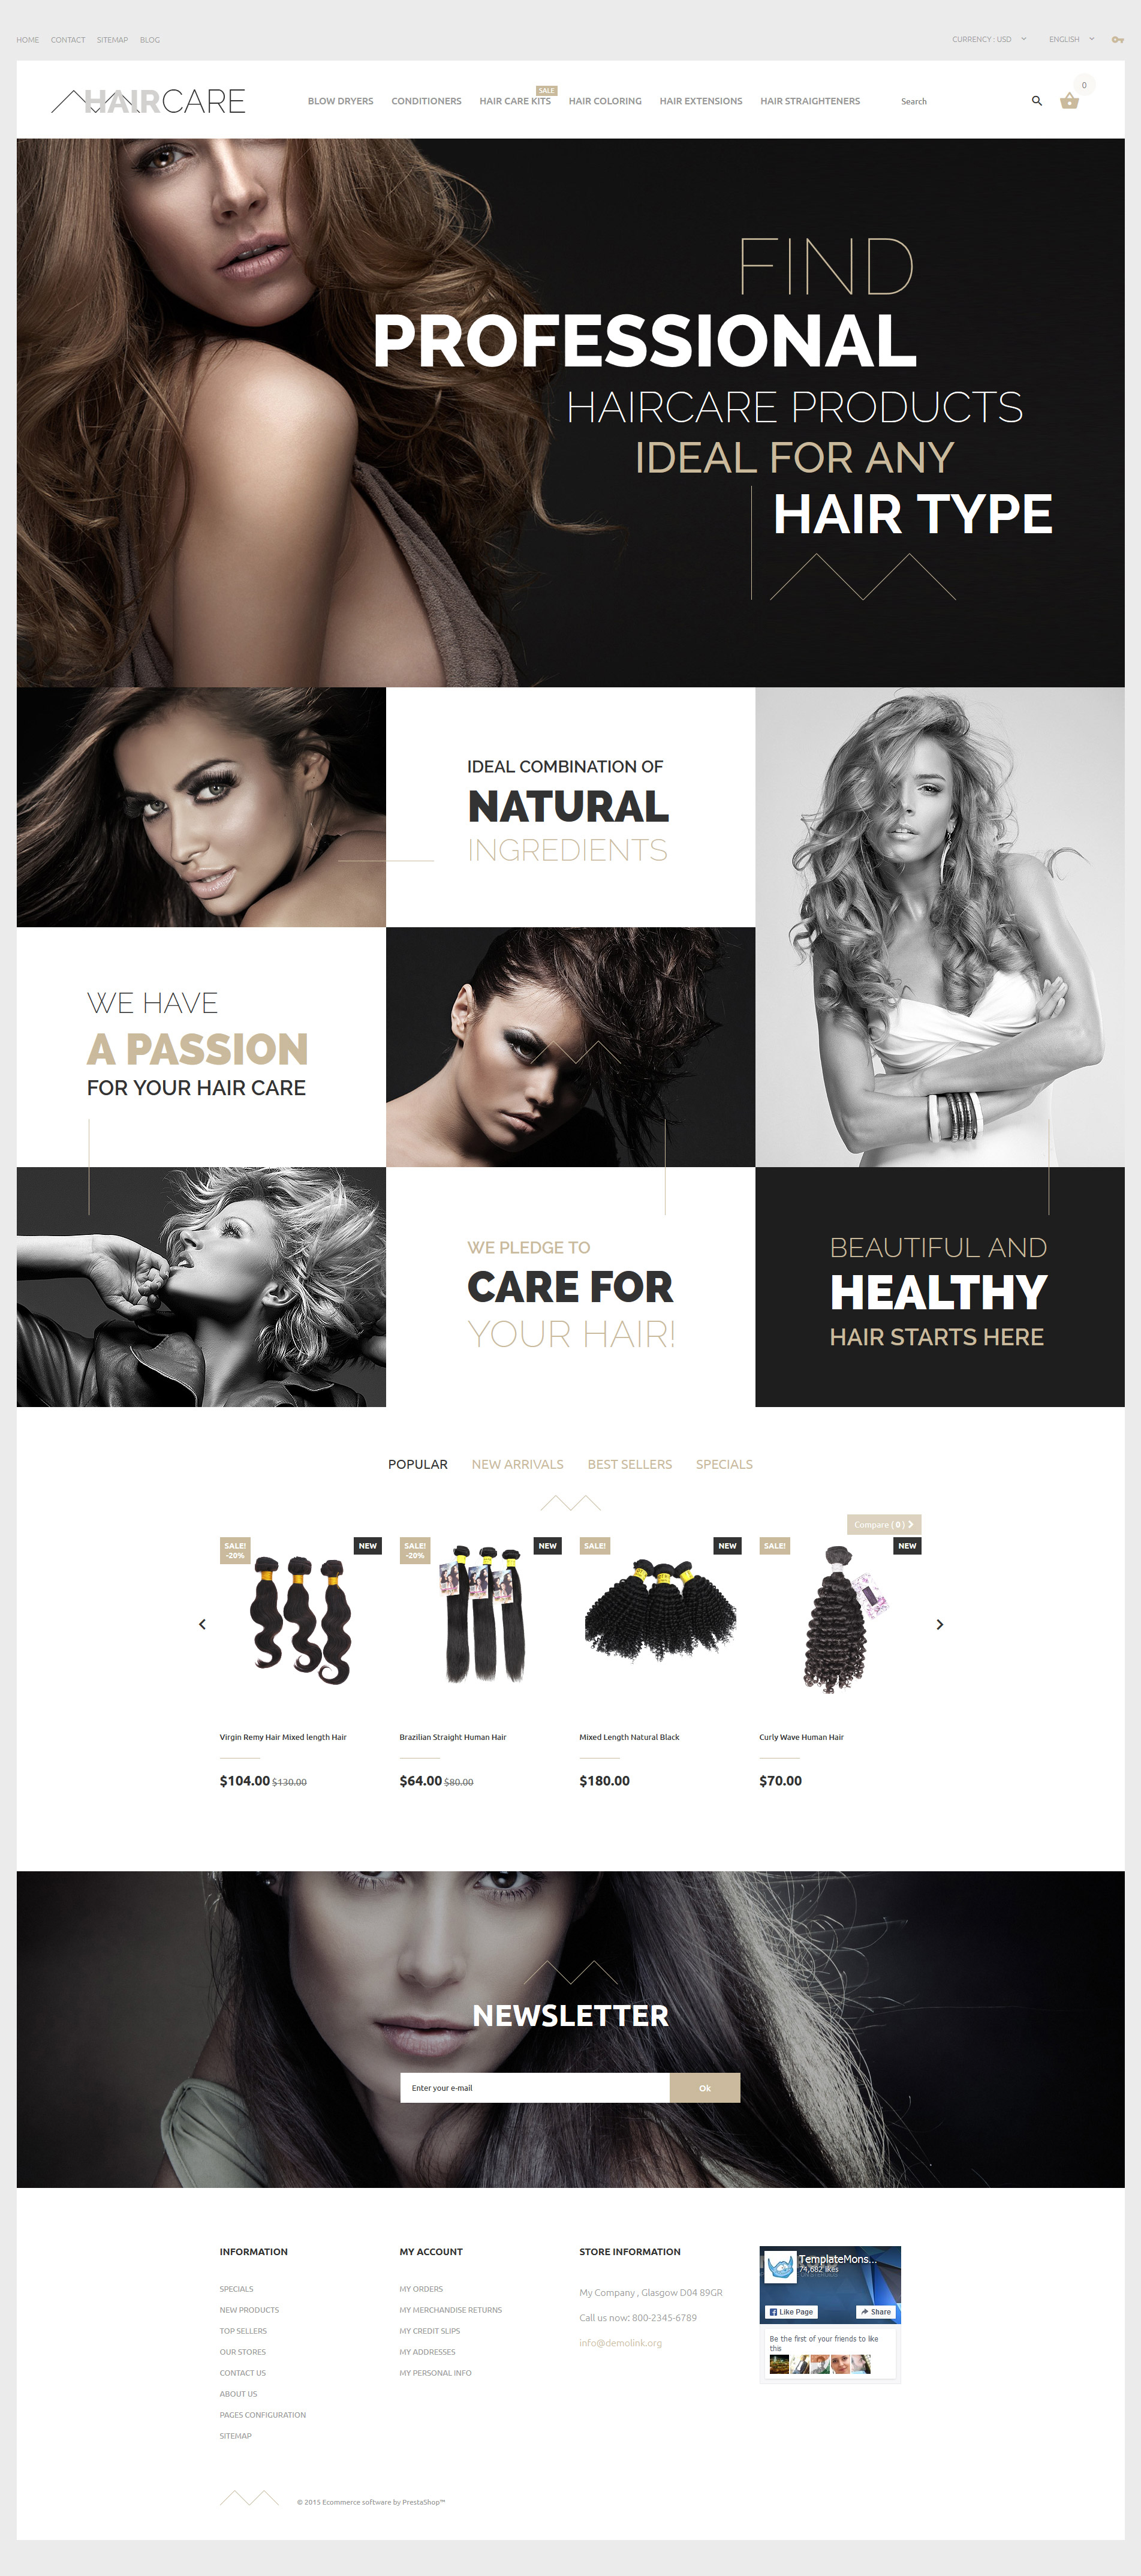 Hair Care №57705 - скриншот